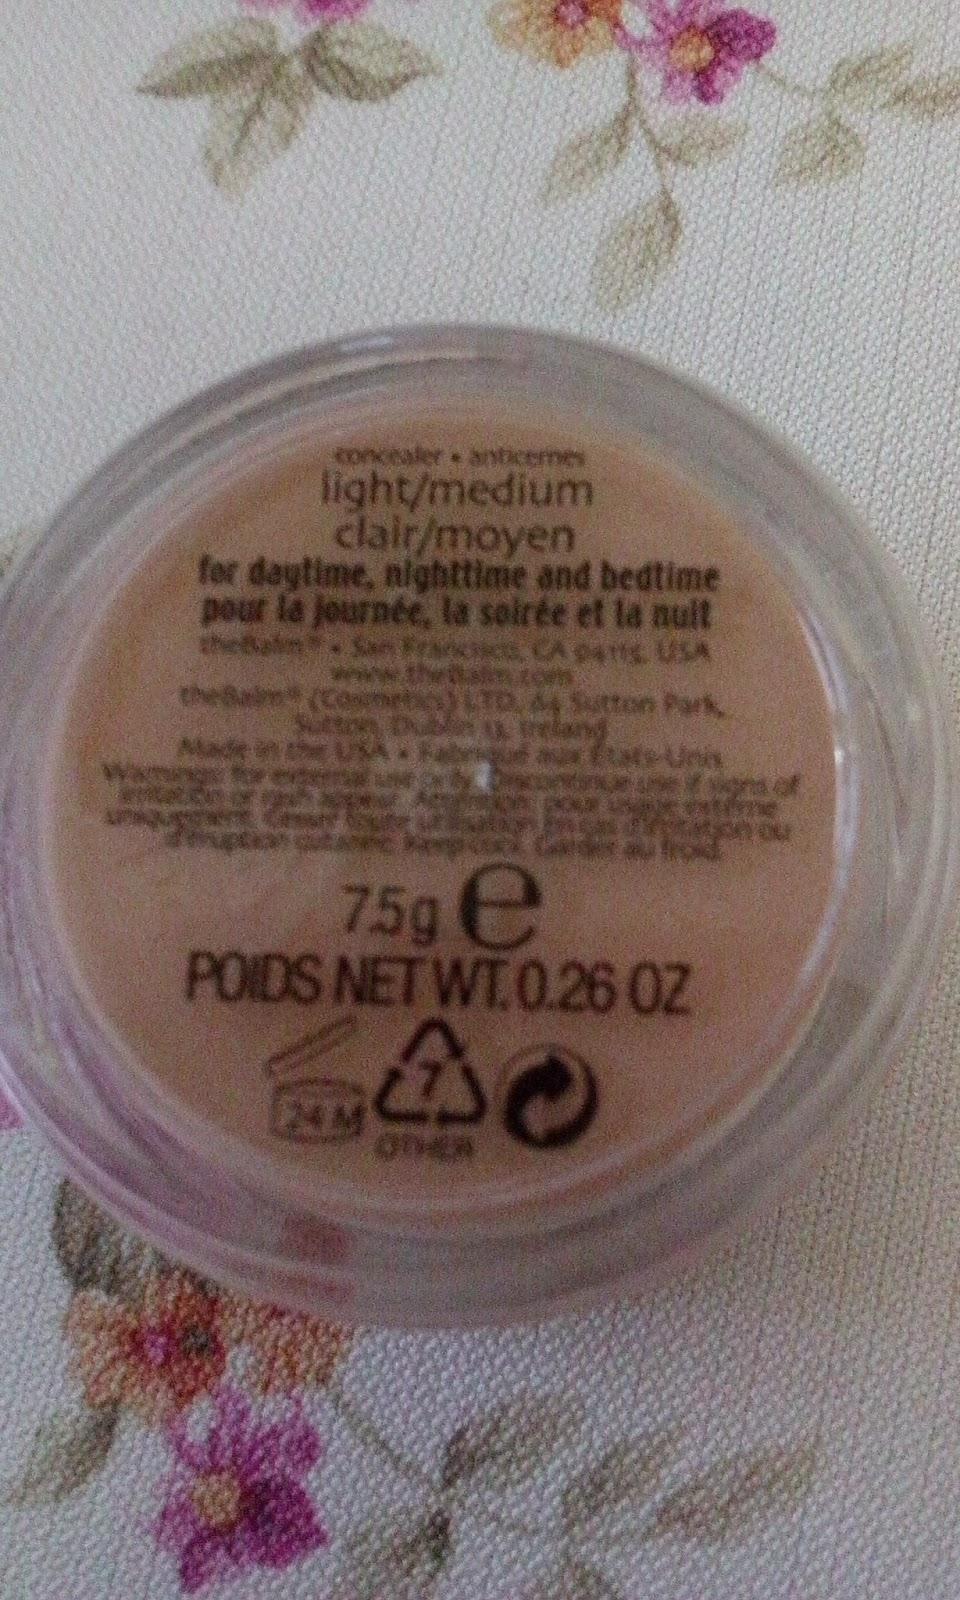 the balm concealar light medium